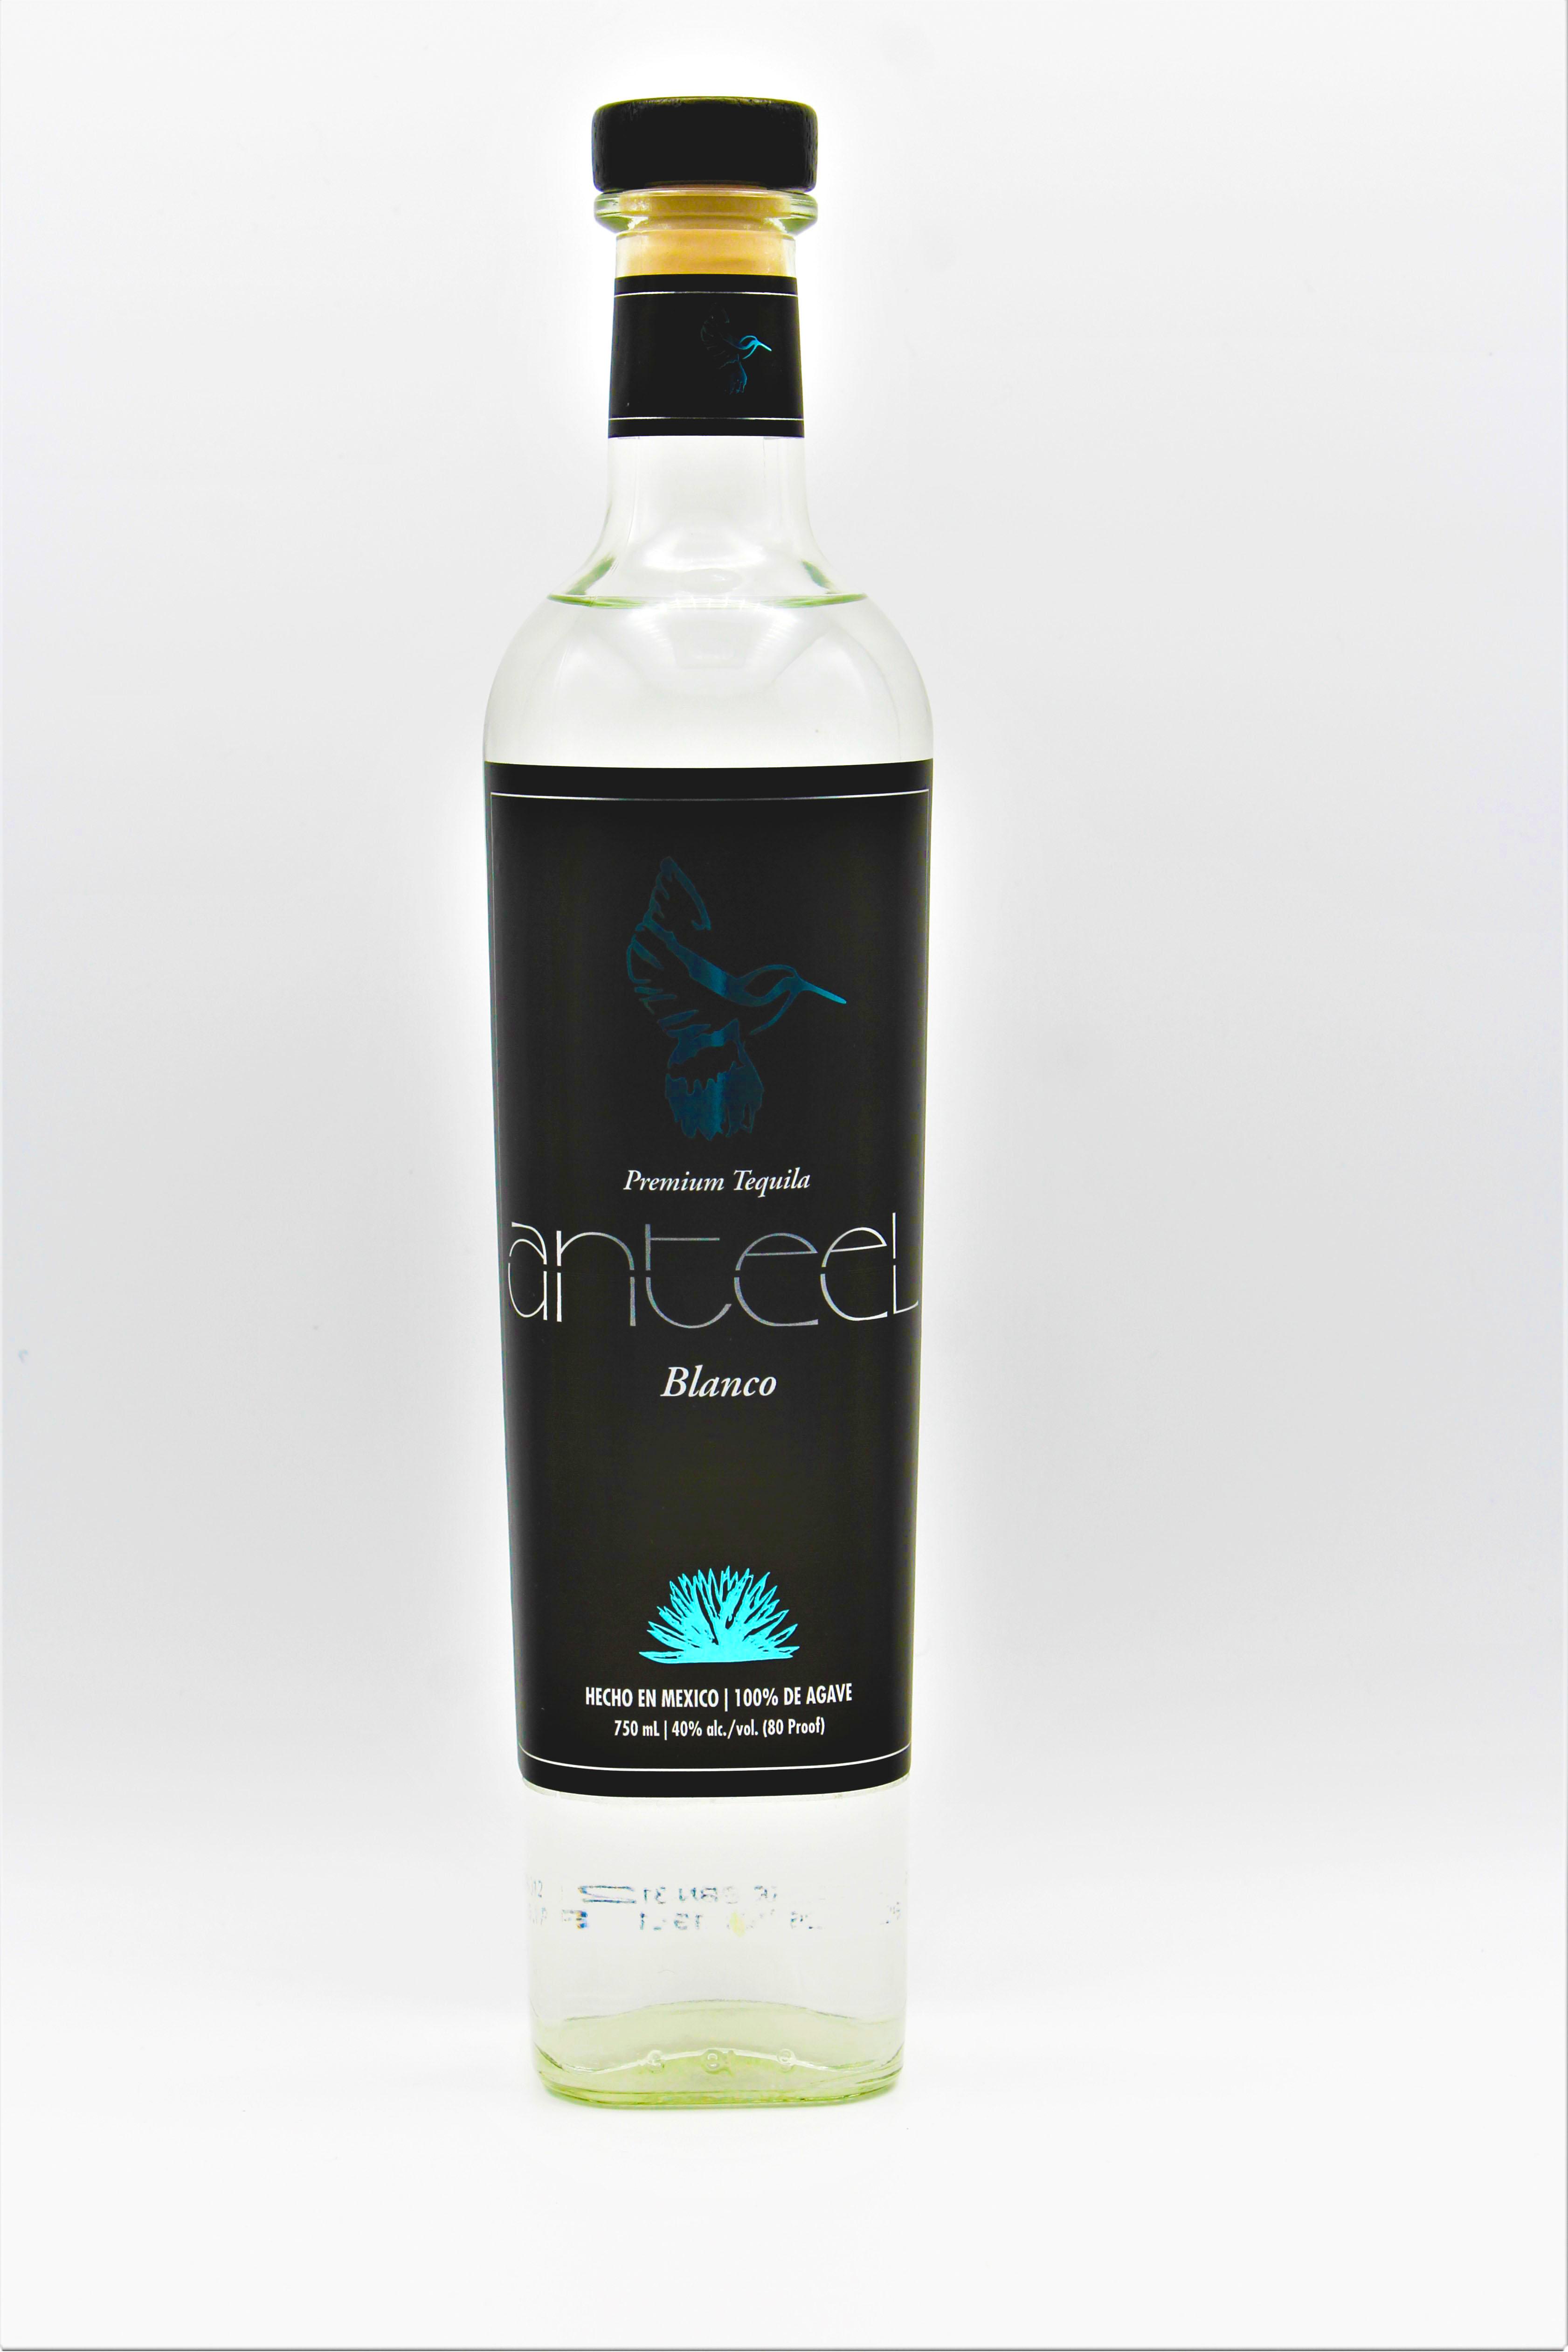 Anteel Blanco Tequila